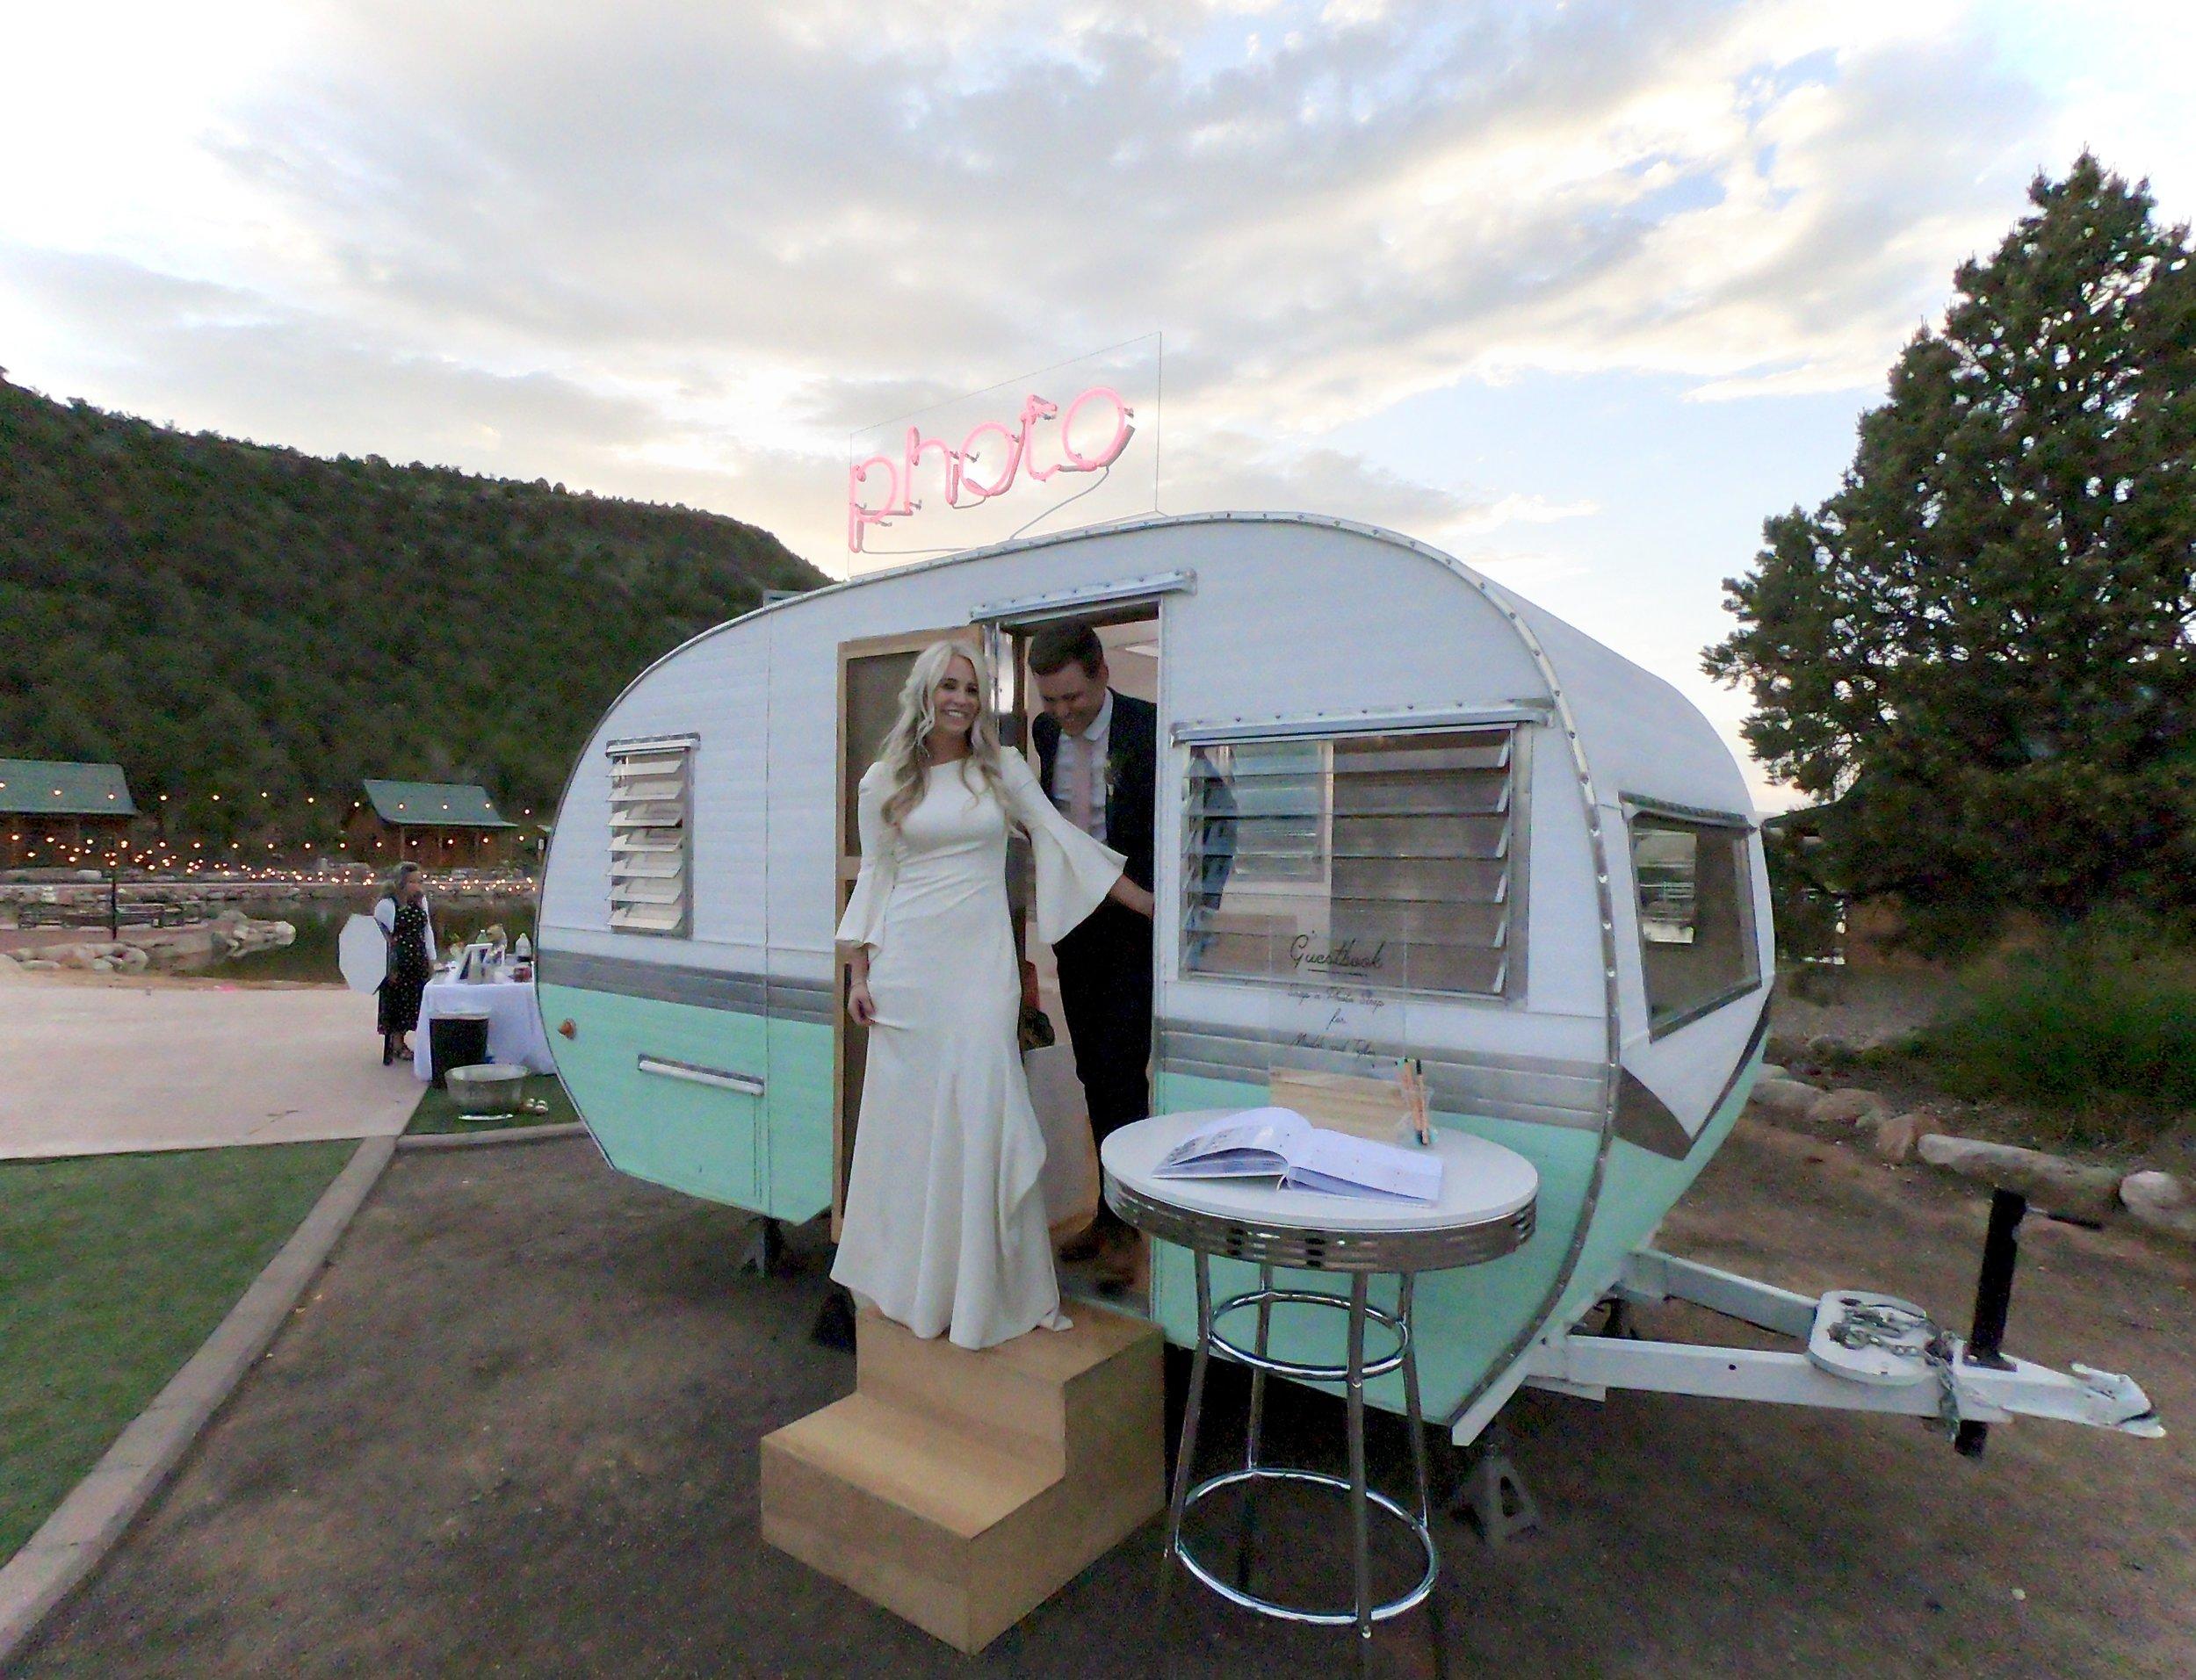 utah wedding photo booth rental